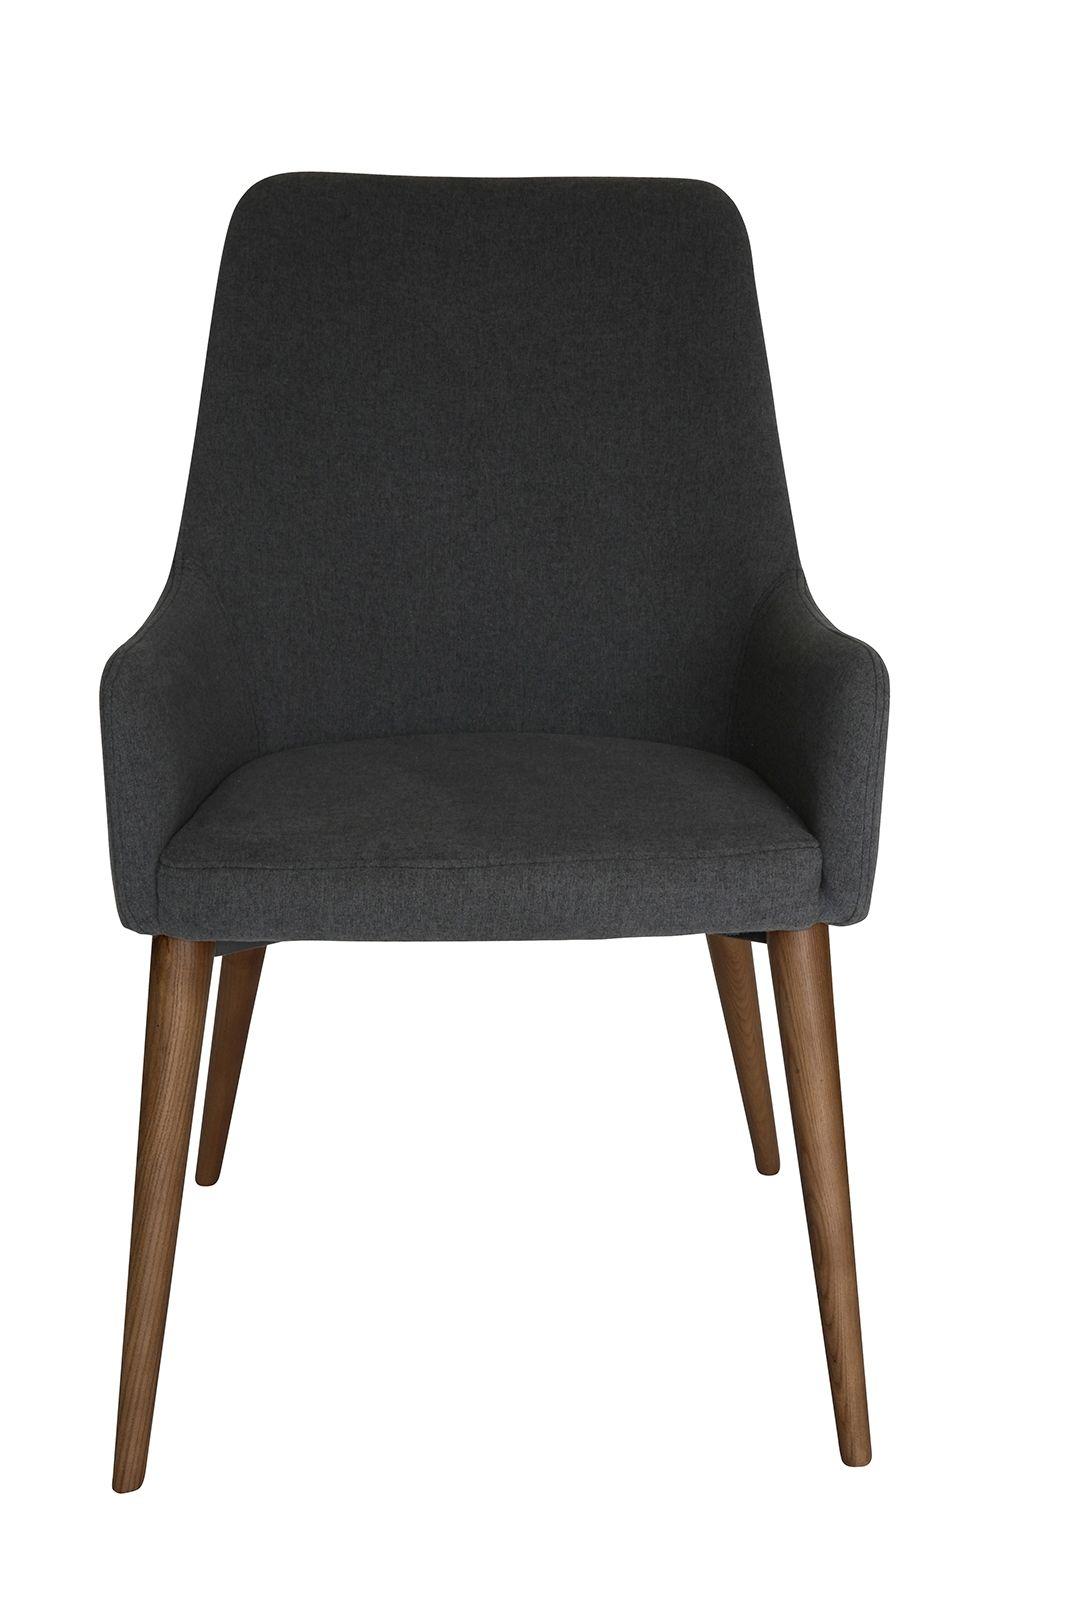 Rio Dining Chair | Dark Grey Fabric | Walnut Legs